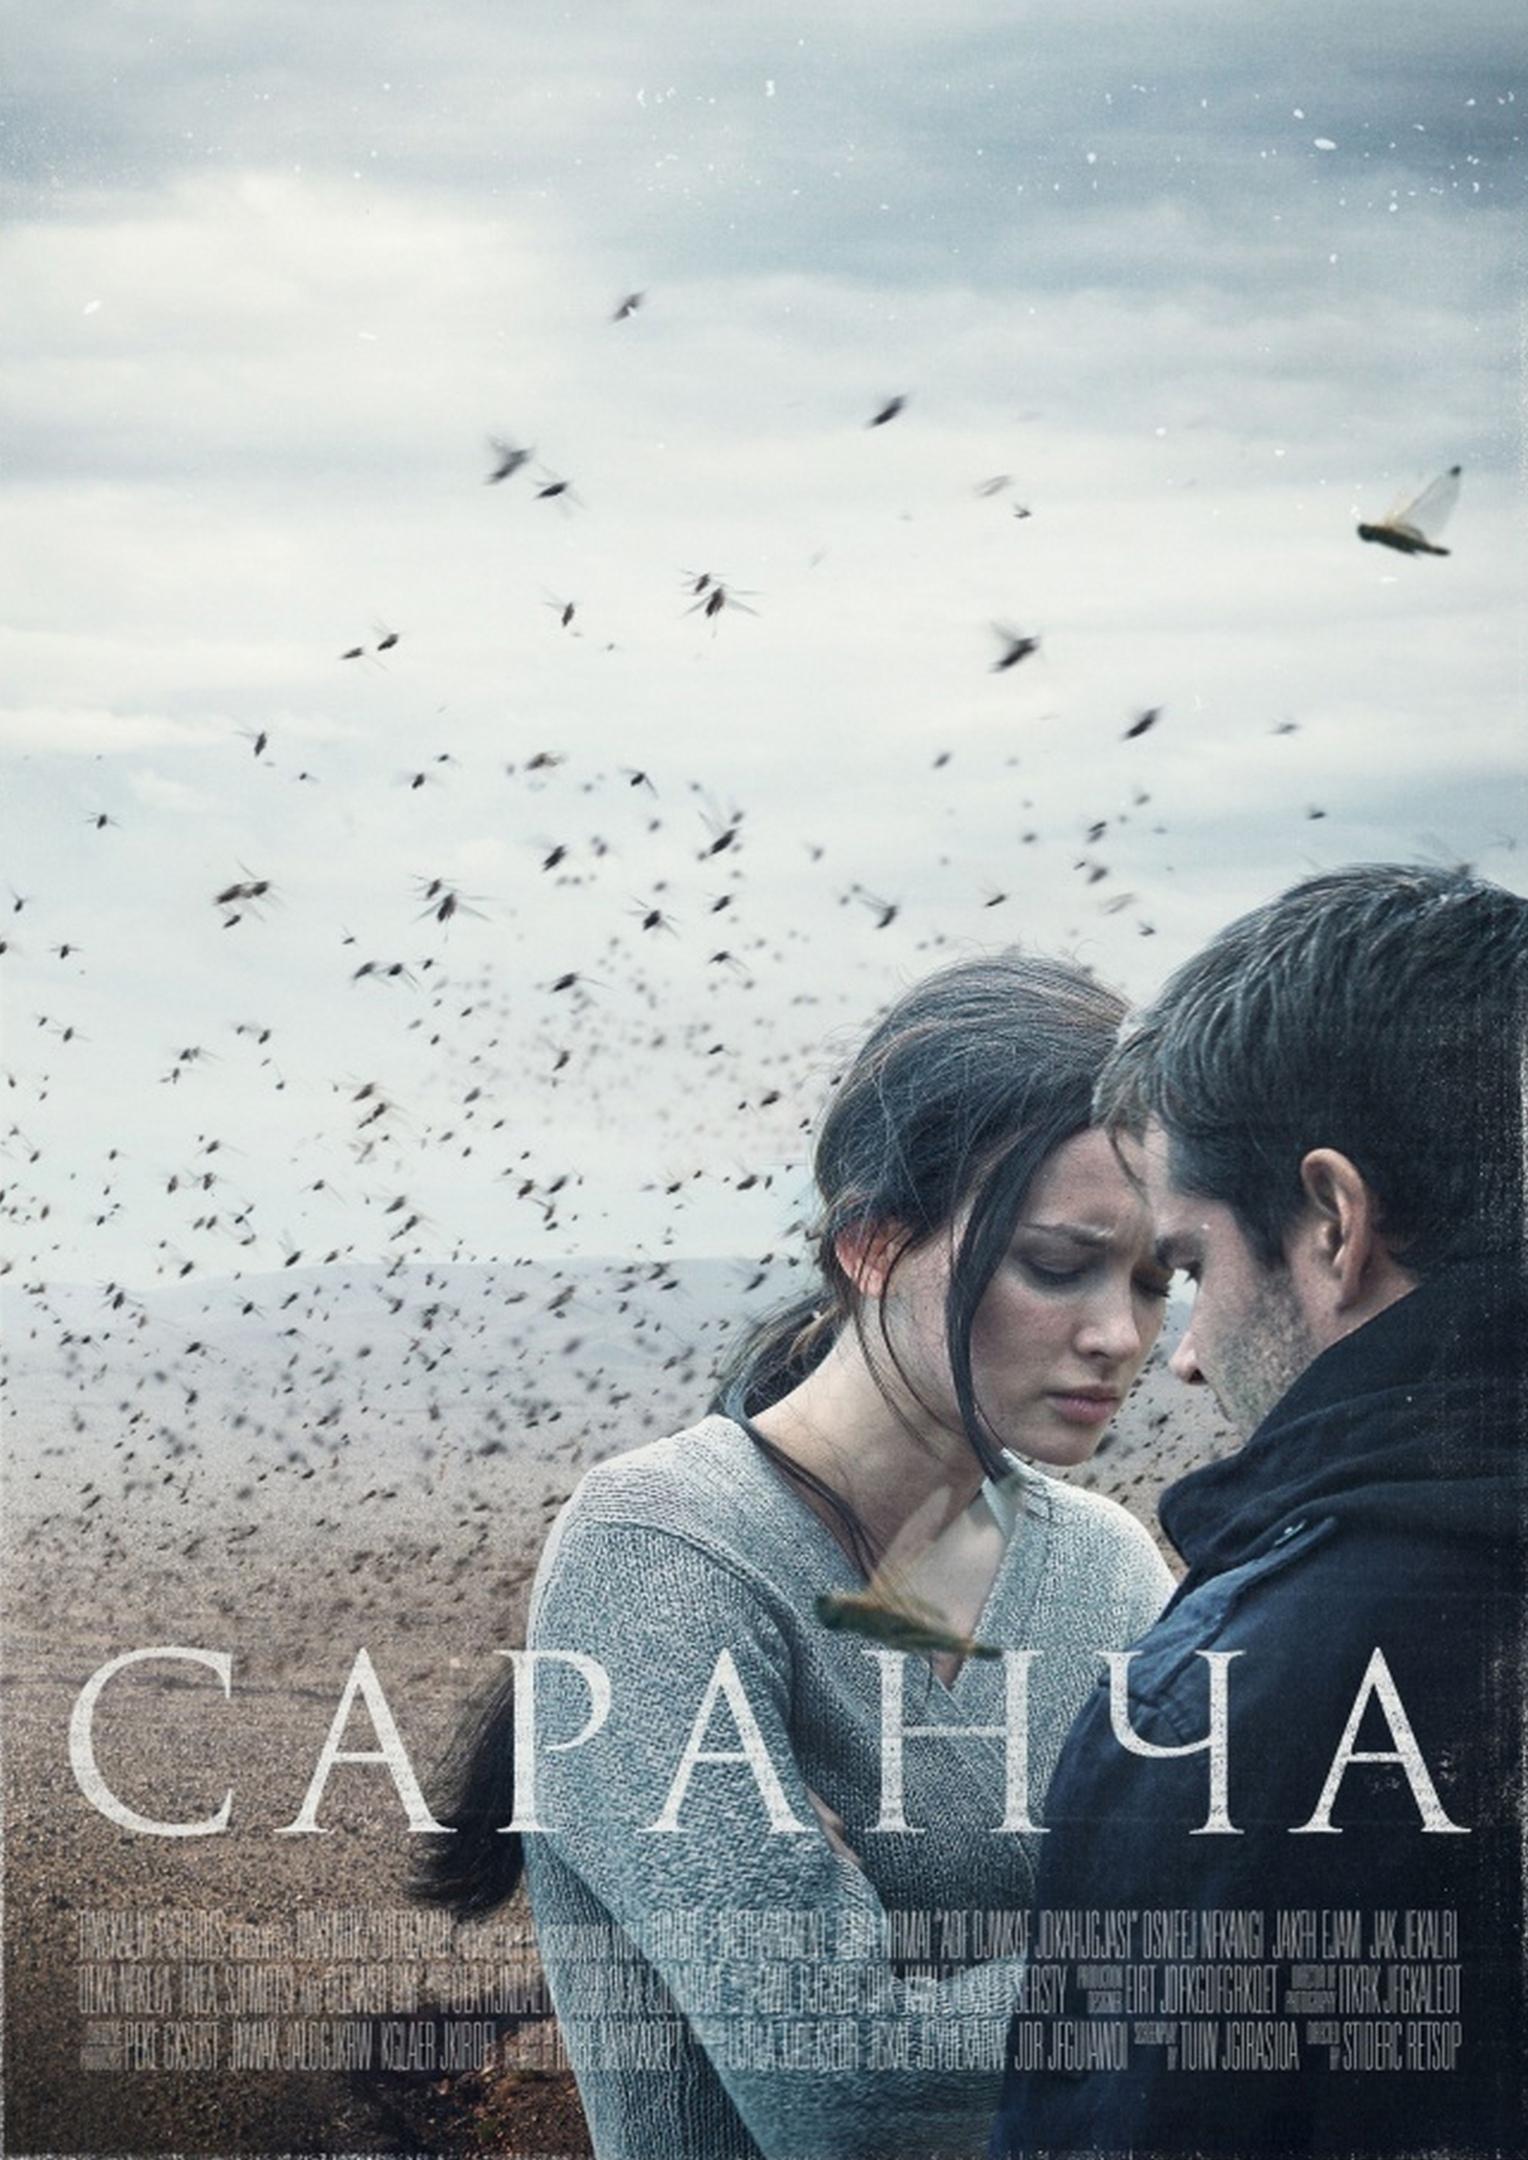 Триллер «Caрaнчa» (2015) Расширенная версия 4 серии HD